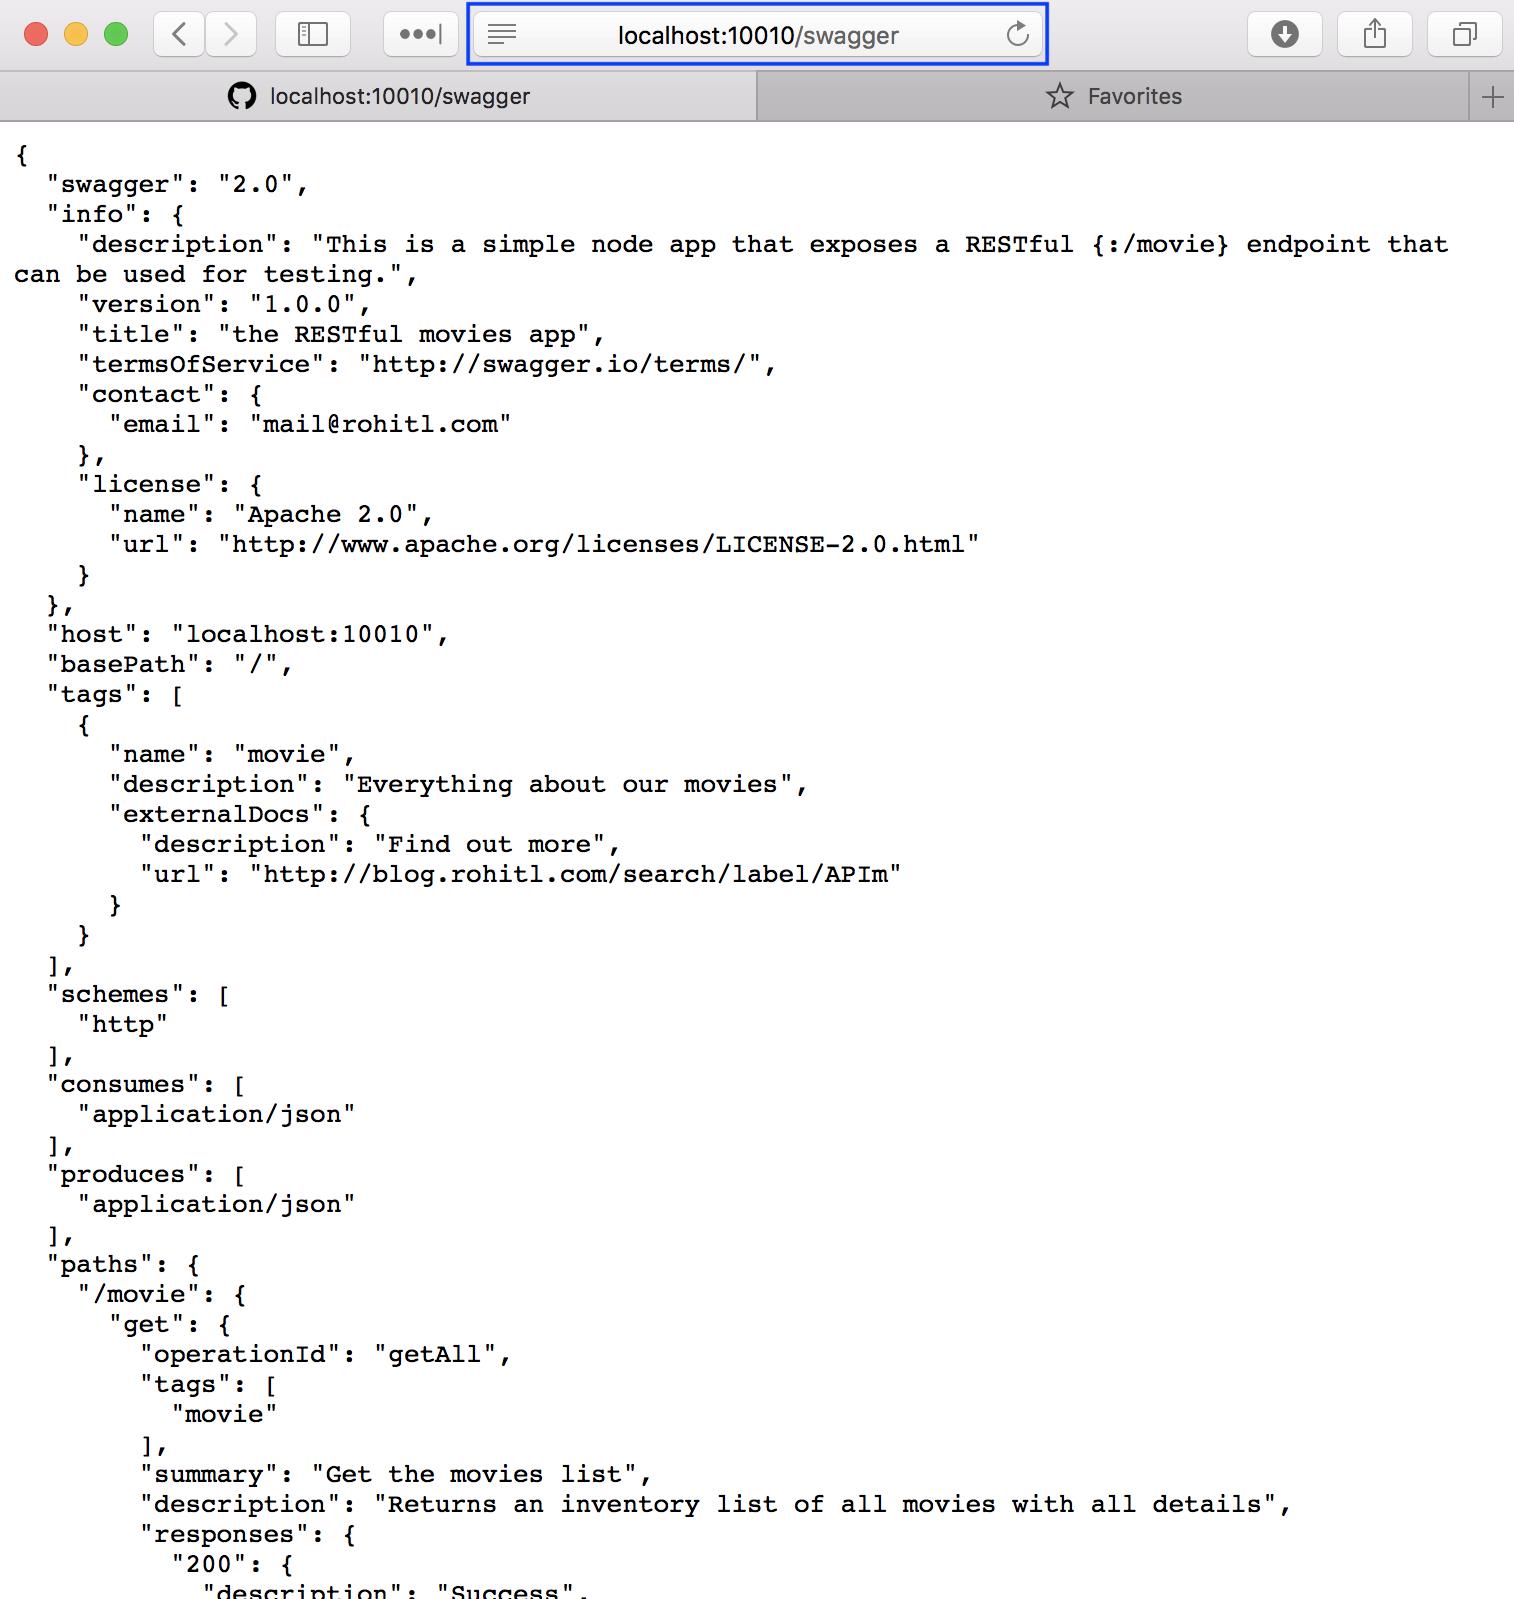 Azure API Management - Your back-end api (Part 2)